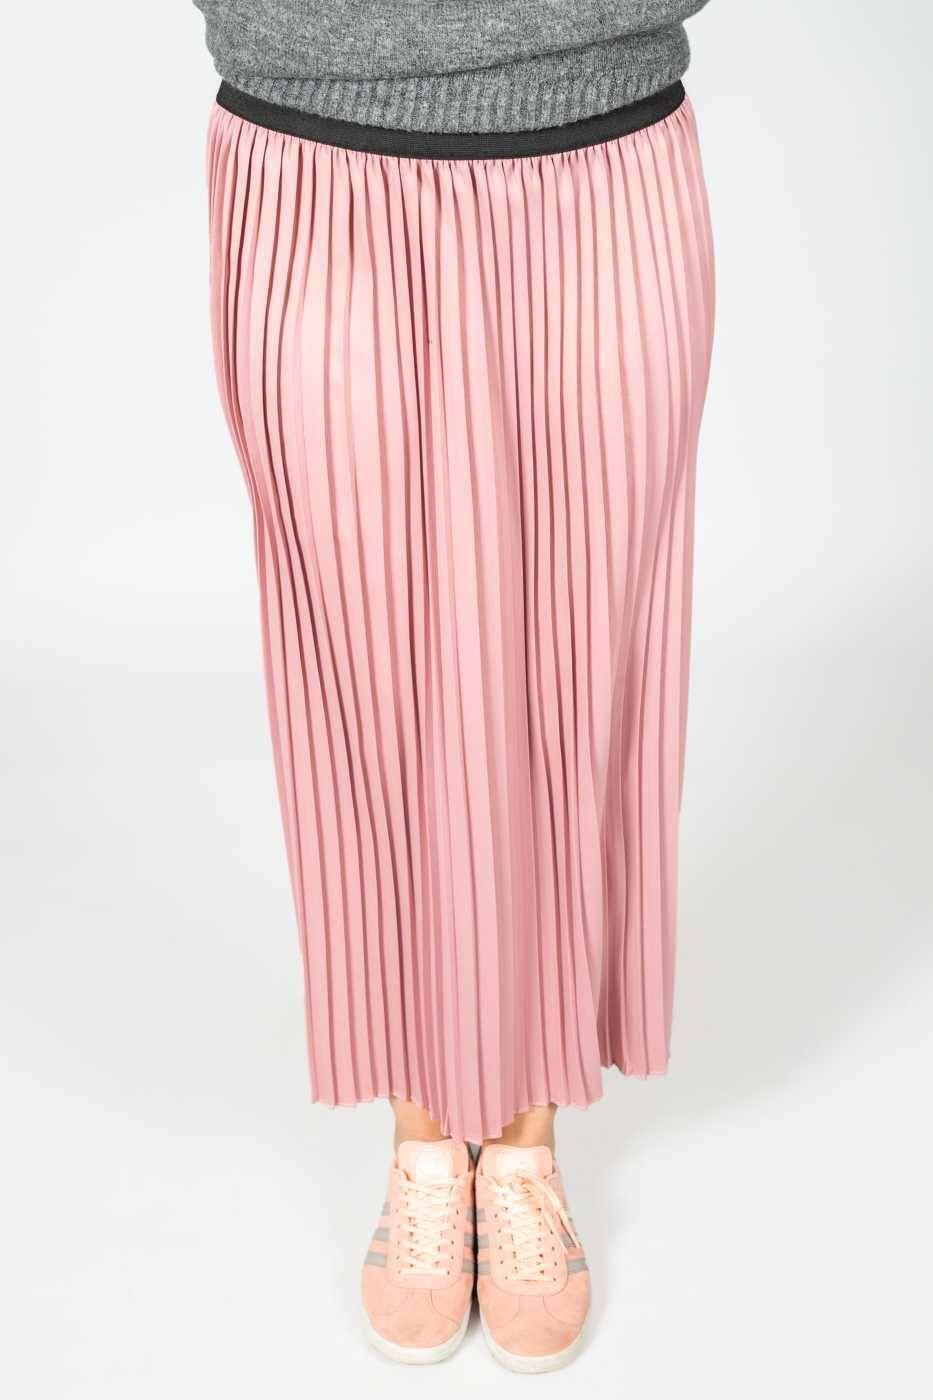 Chloe Skirt Pink